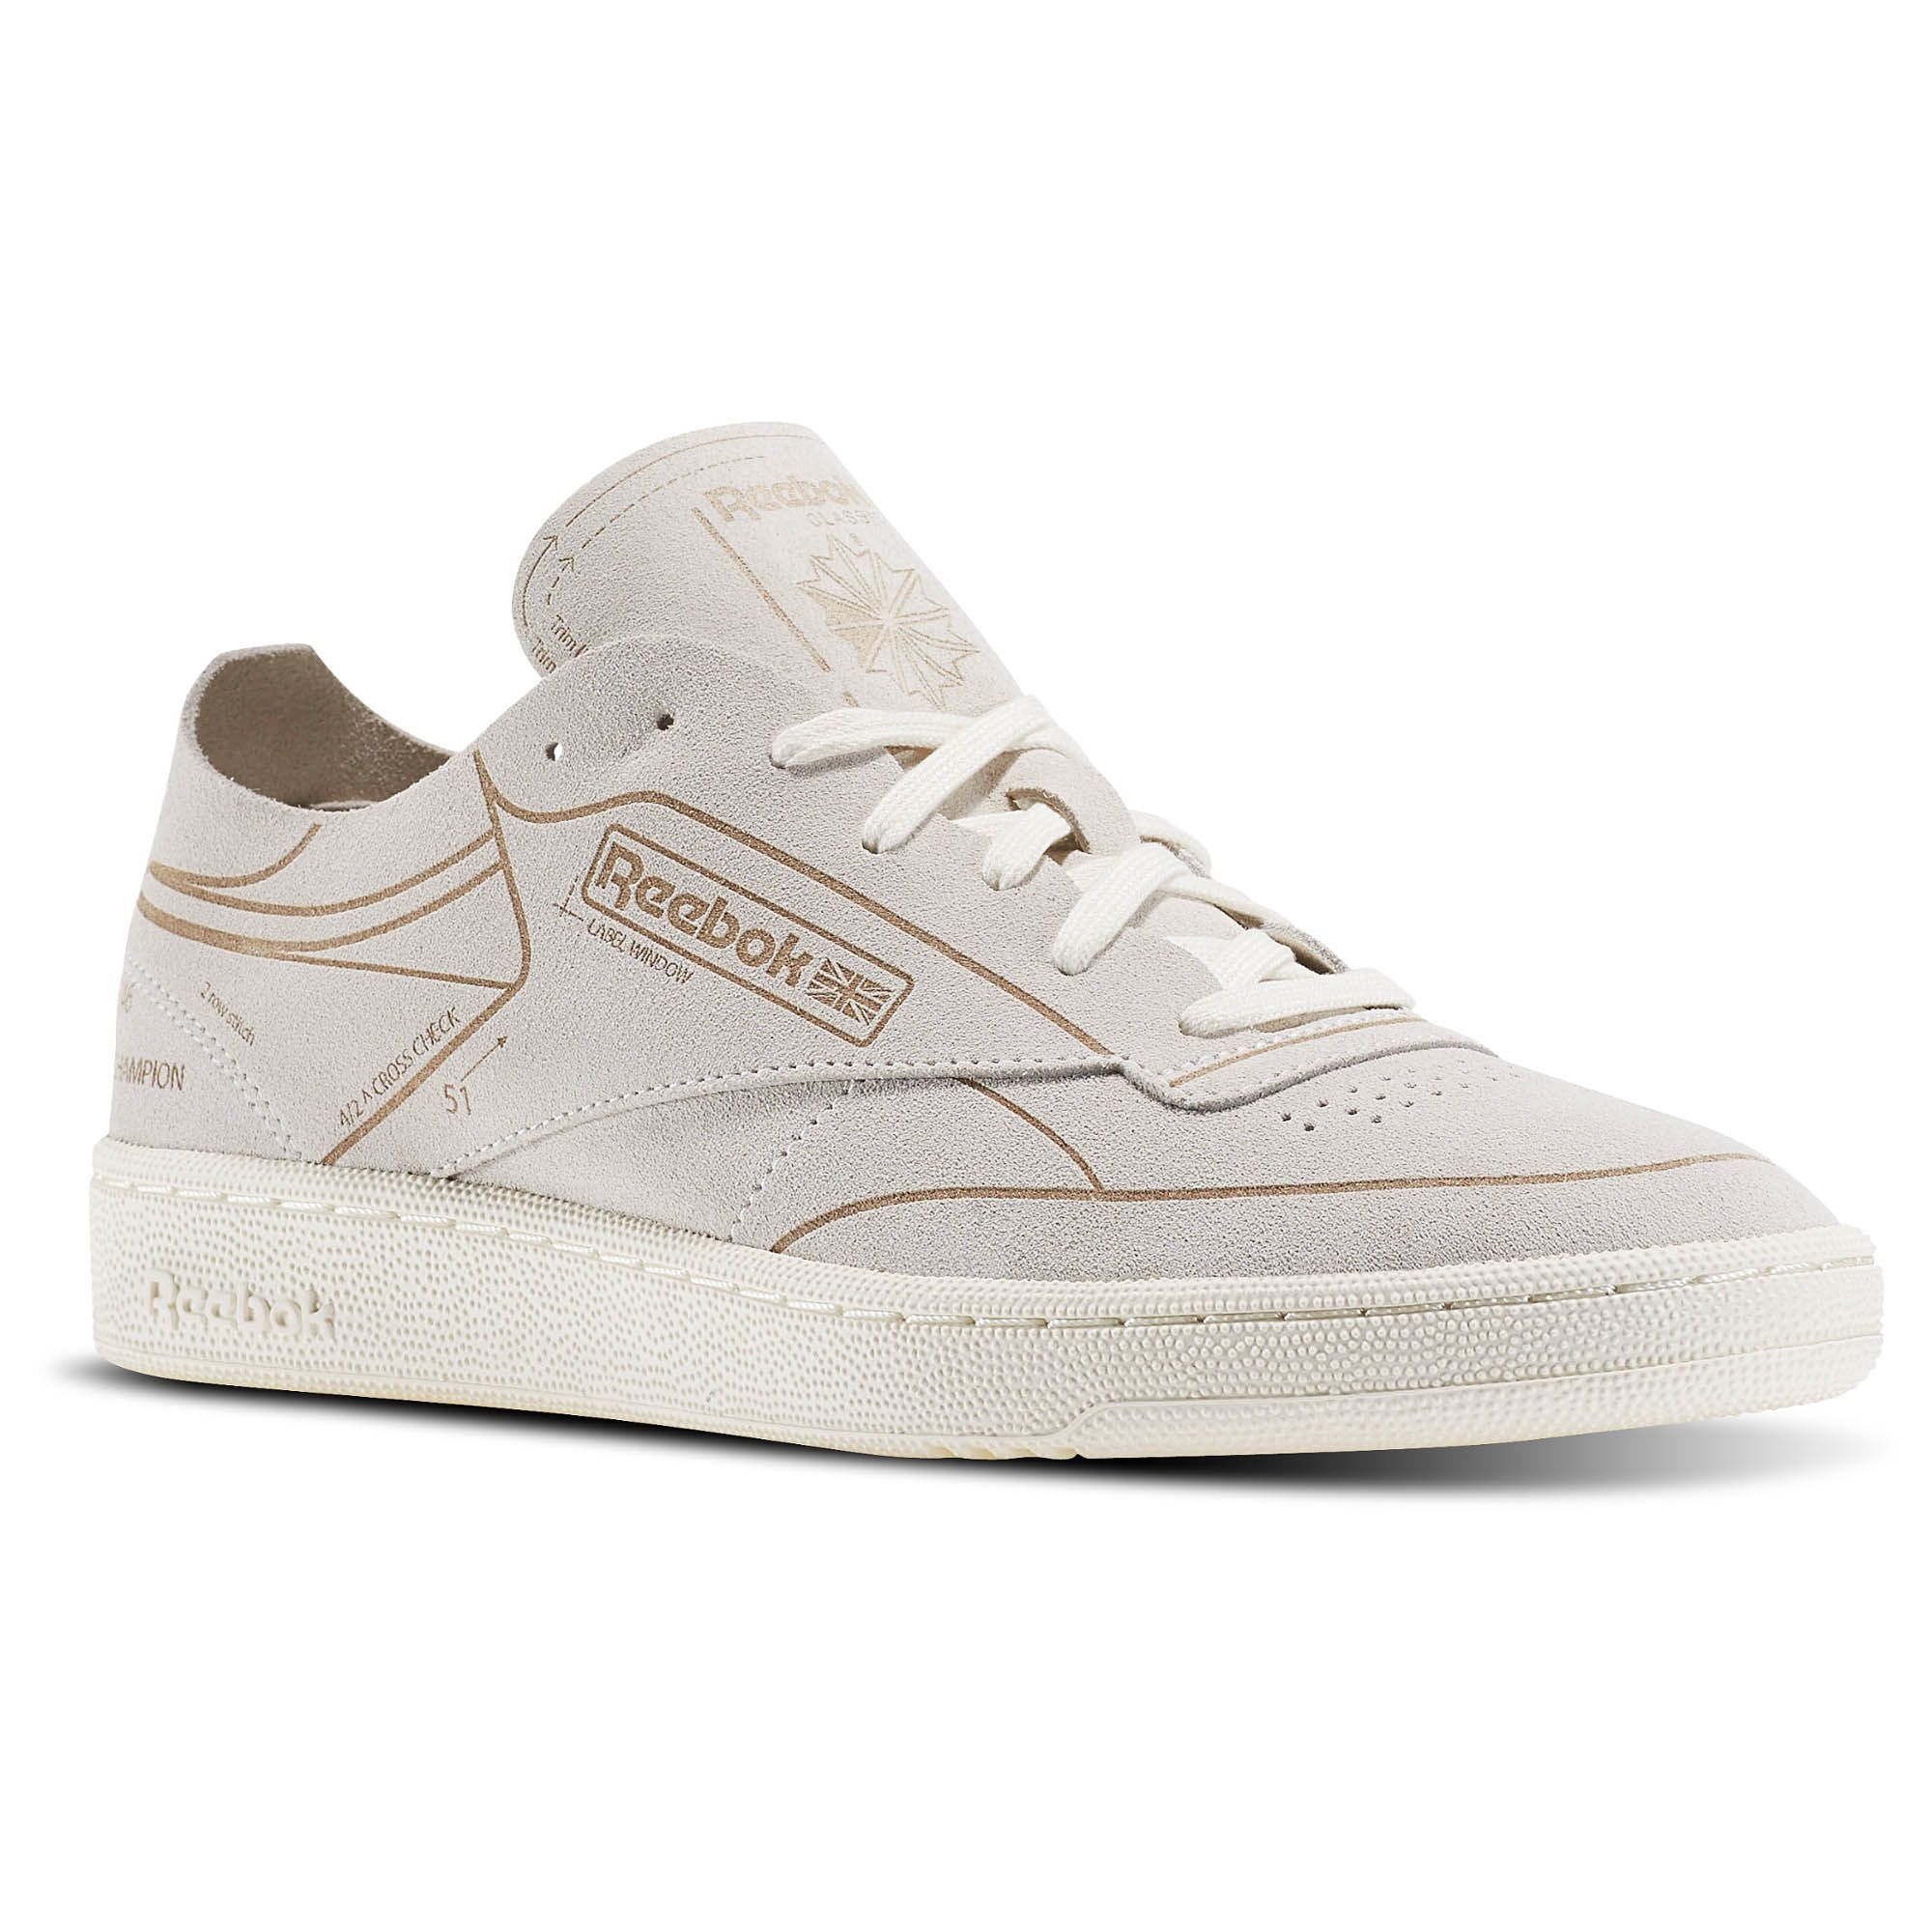 Club 85 C W Chaussures Mâle Blanc o3d6wy